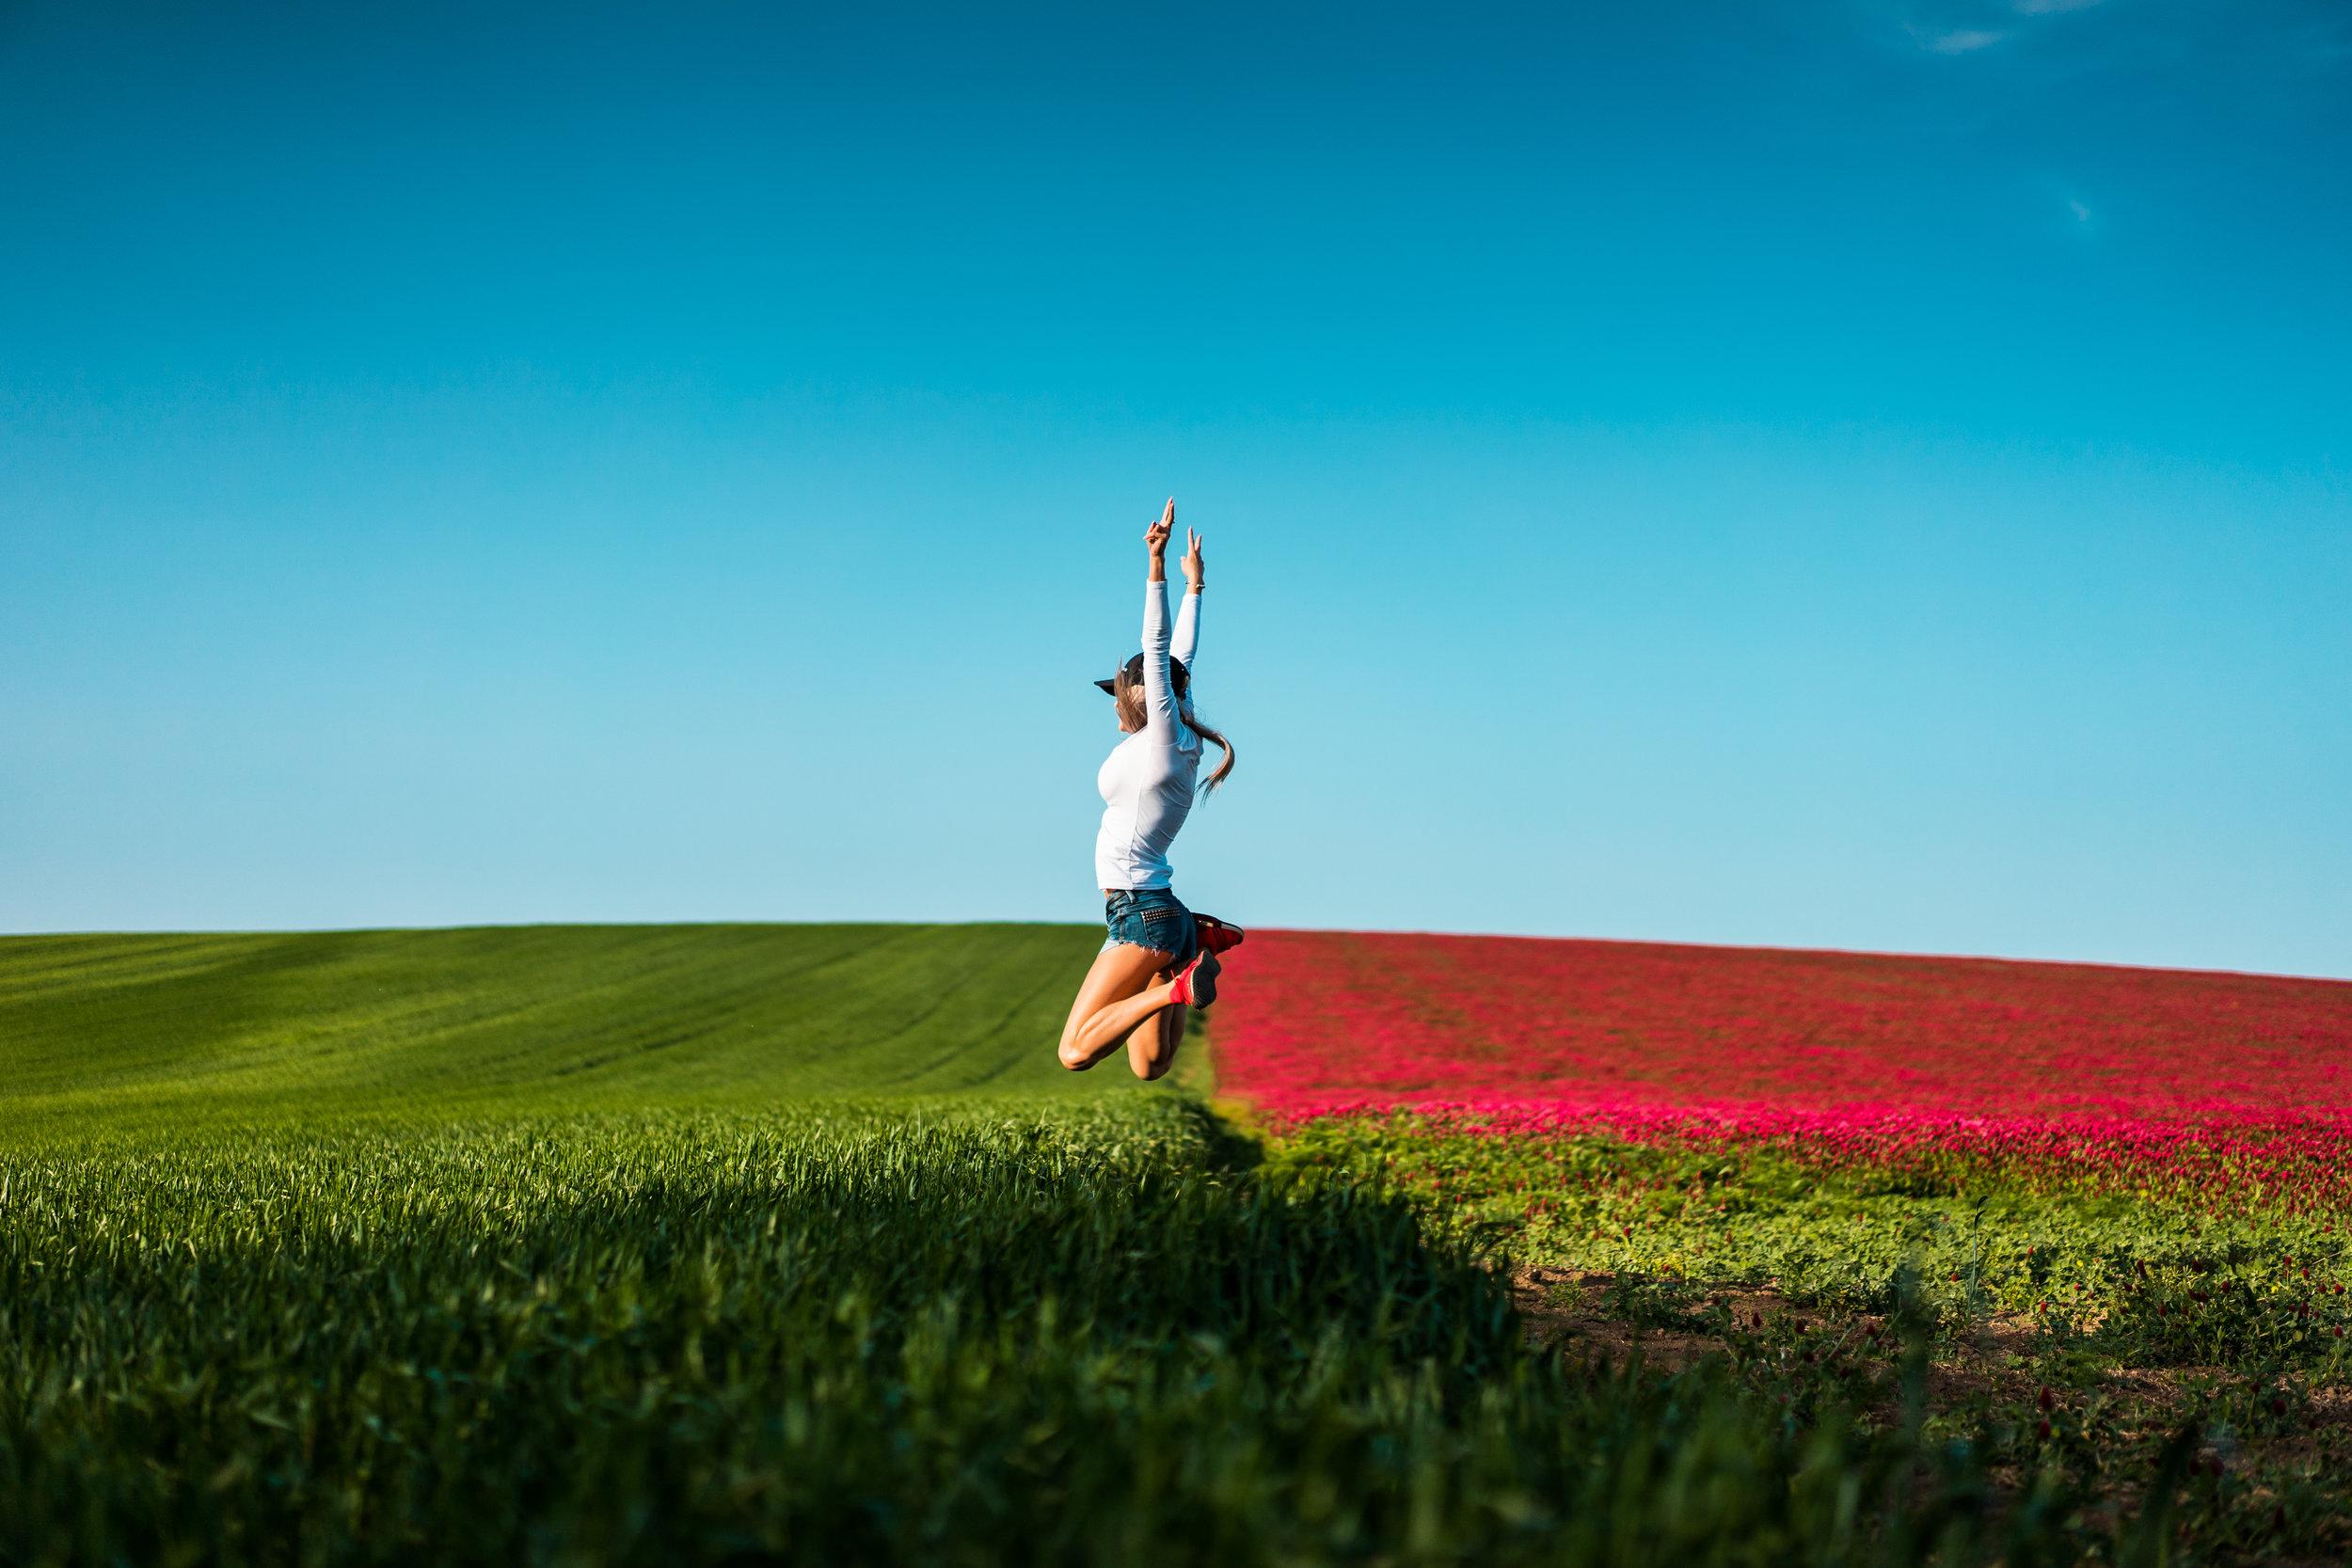 happy-woman-jumping-in-the-air-picjumbo-com.jpg